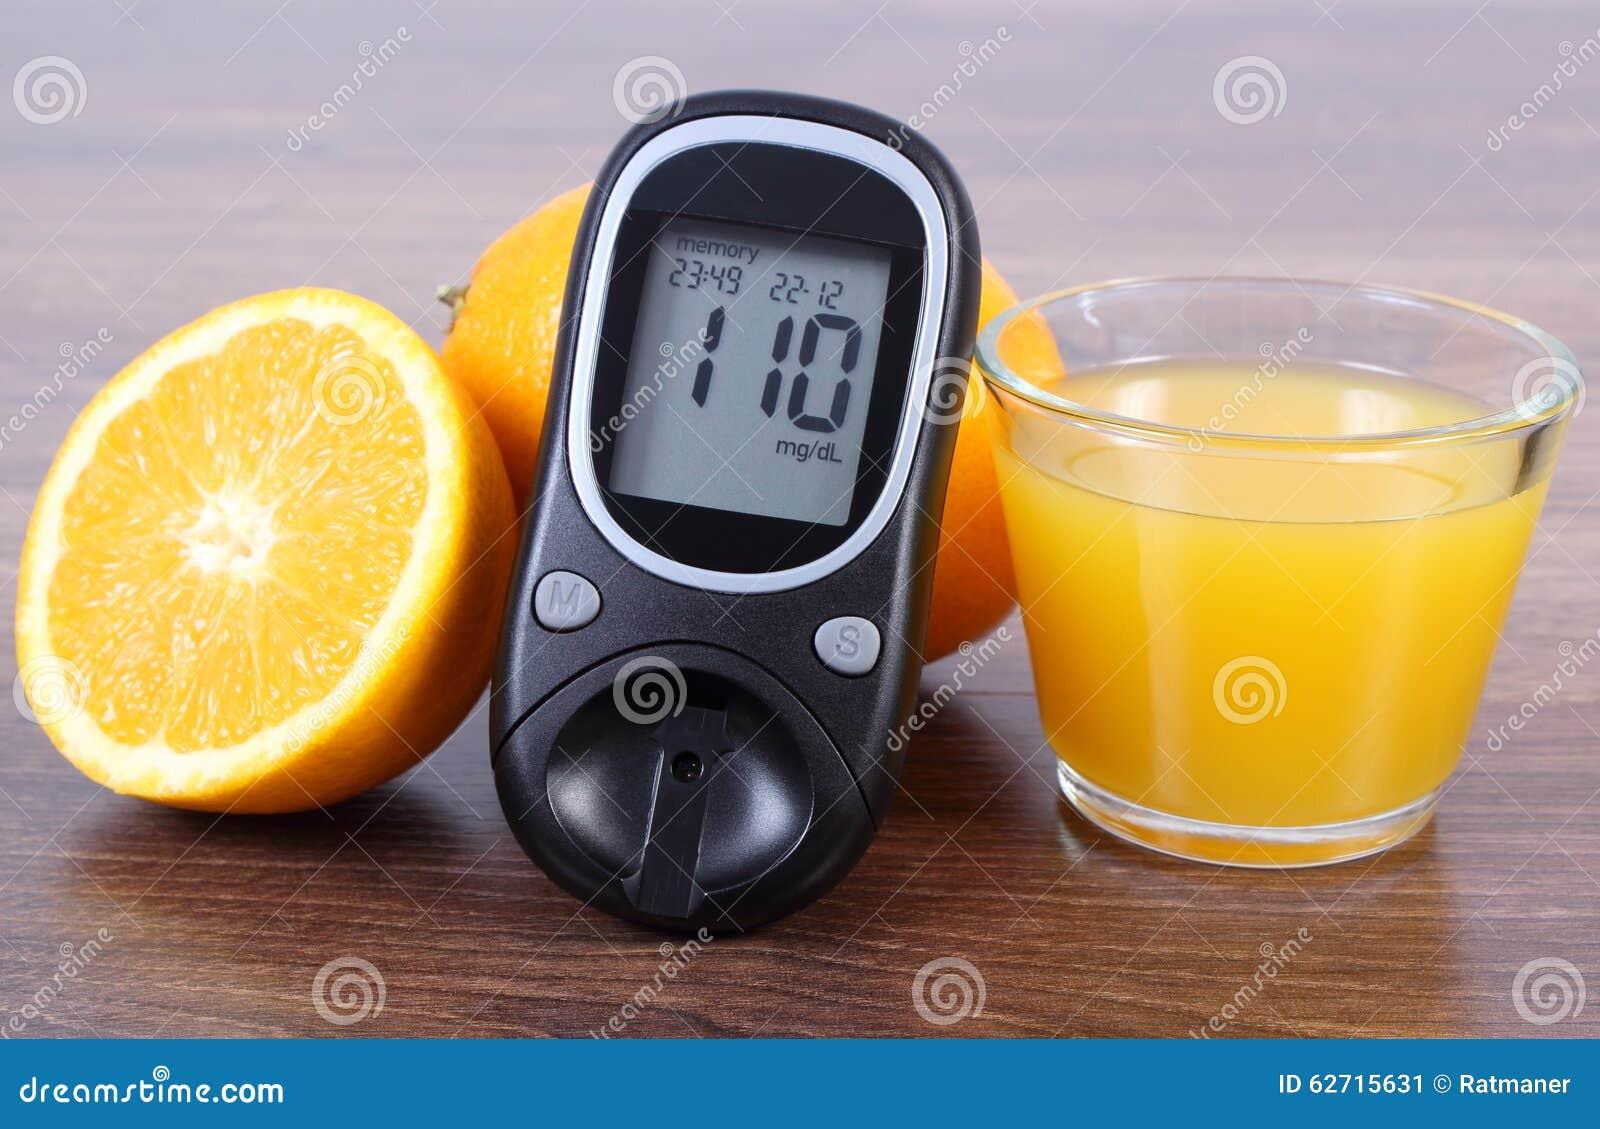 Spuntini Sani E Diabete : Glucometer arancia e succo fresco diabete stili di vita sani e